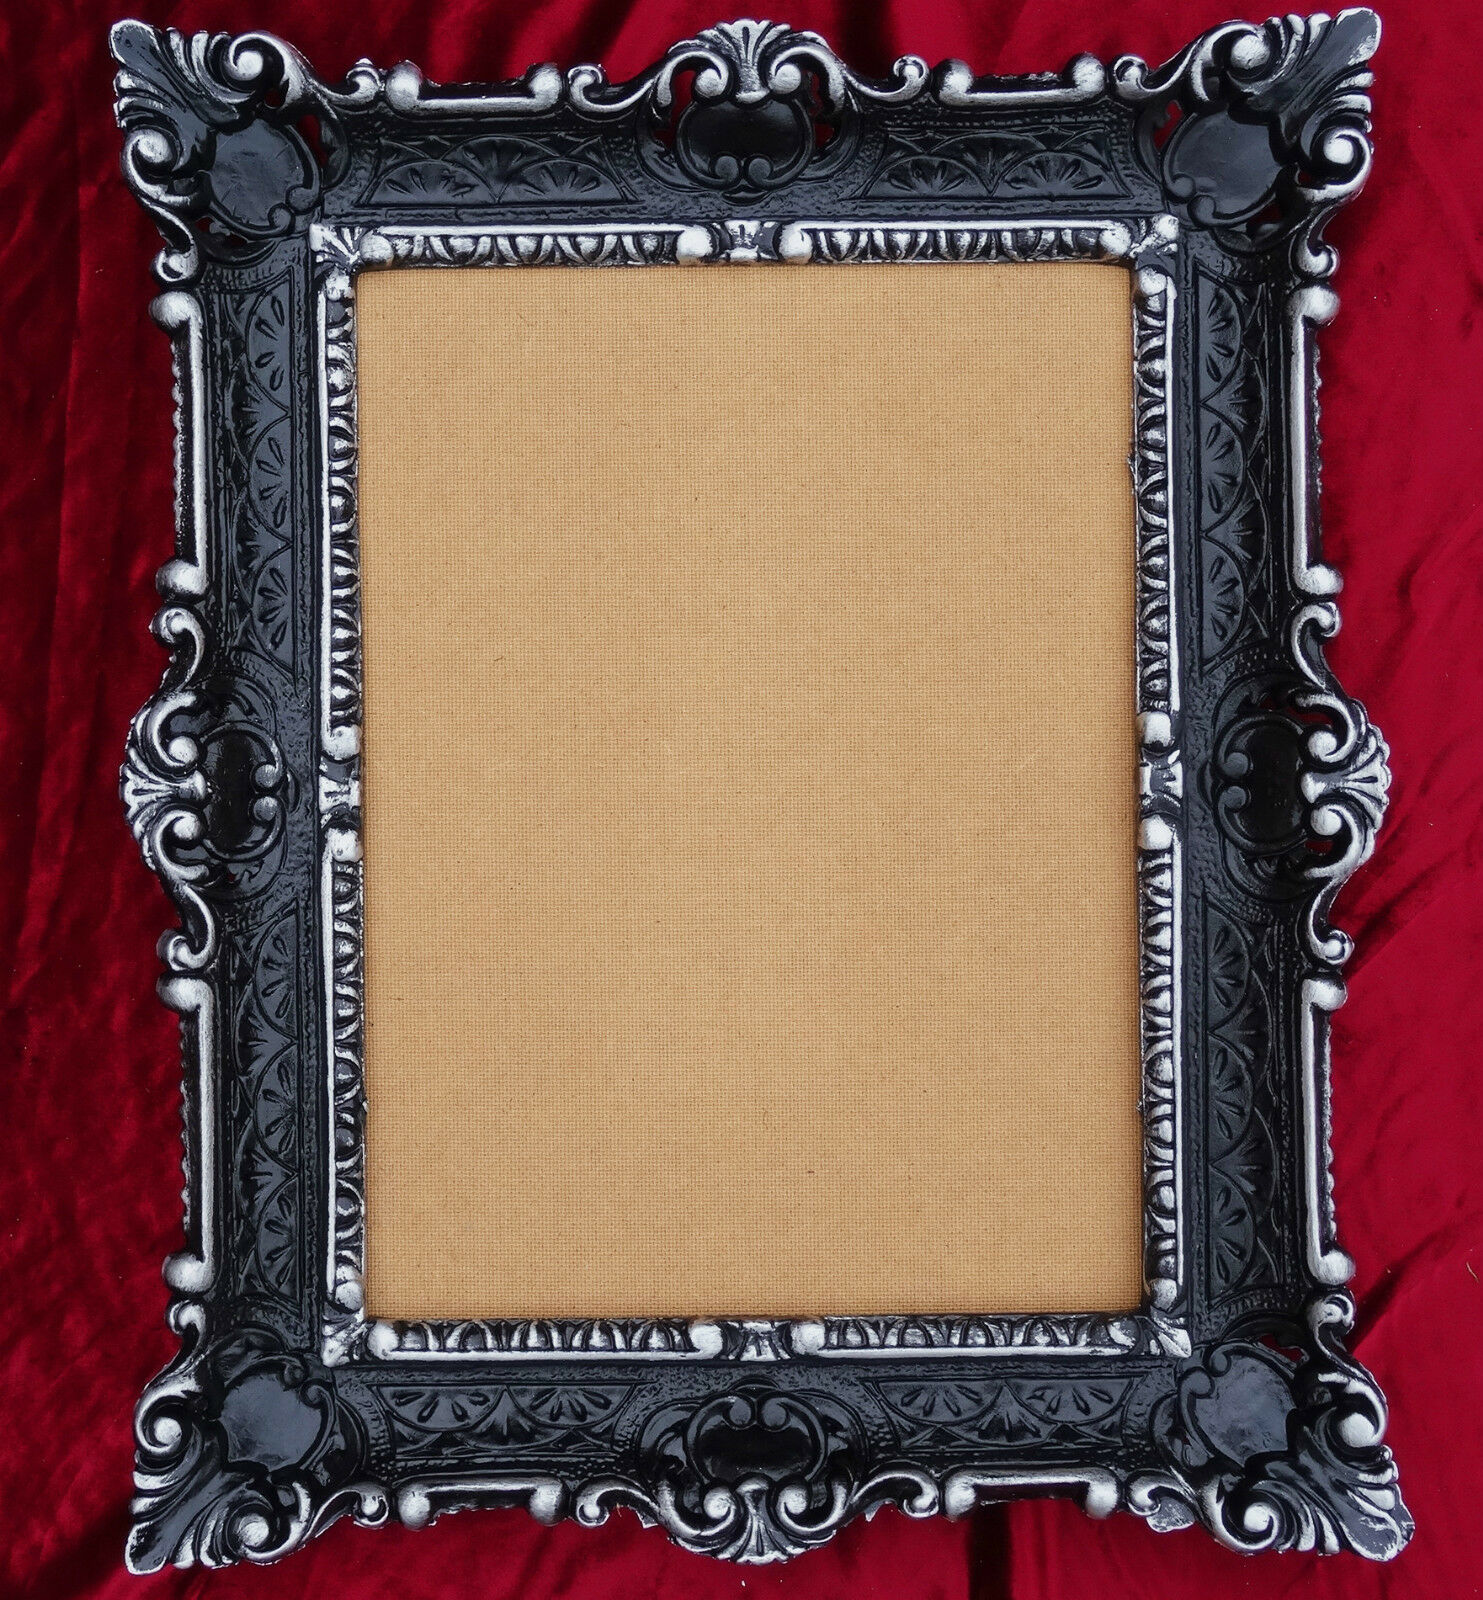 antik barock bilderrahmen schwarz silber 56x46 fotorahmen replikate bildrahmen ebay. Black Bedroom Furniture Sets. Home Design Ideas